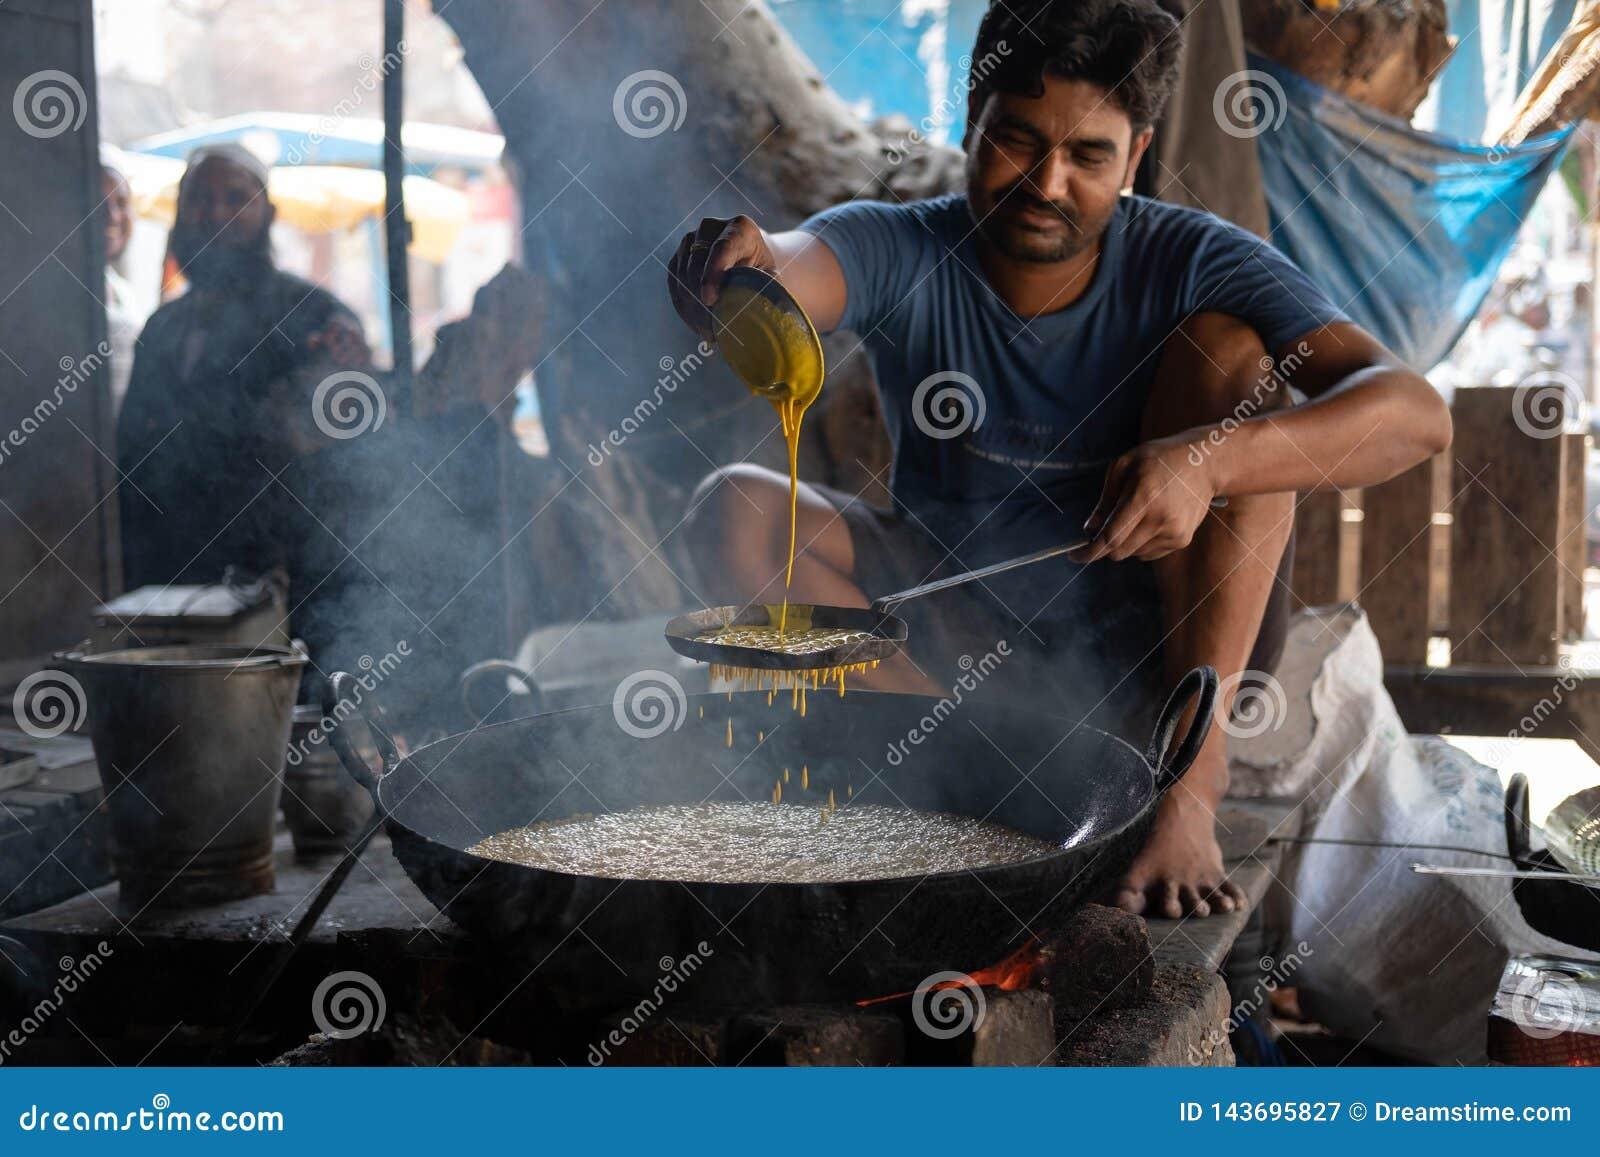 Bhadarsa, Uttar Pradesh / India - April 2, 2019: A man frys up jalebi street side in Bhadarsa.